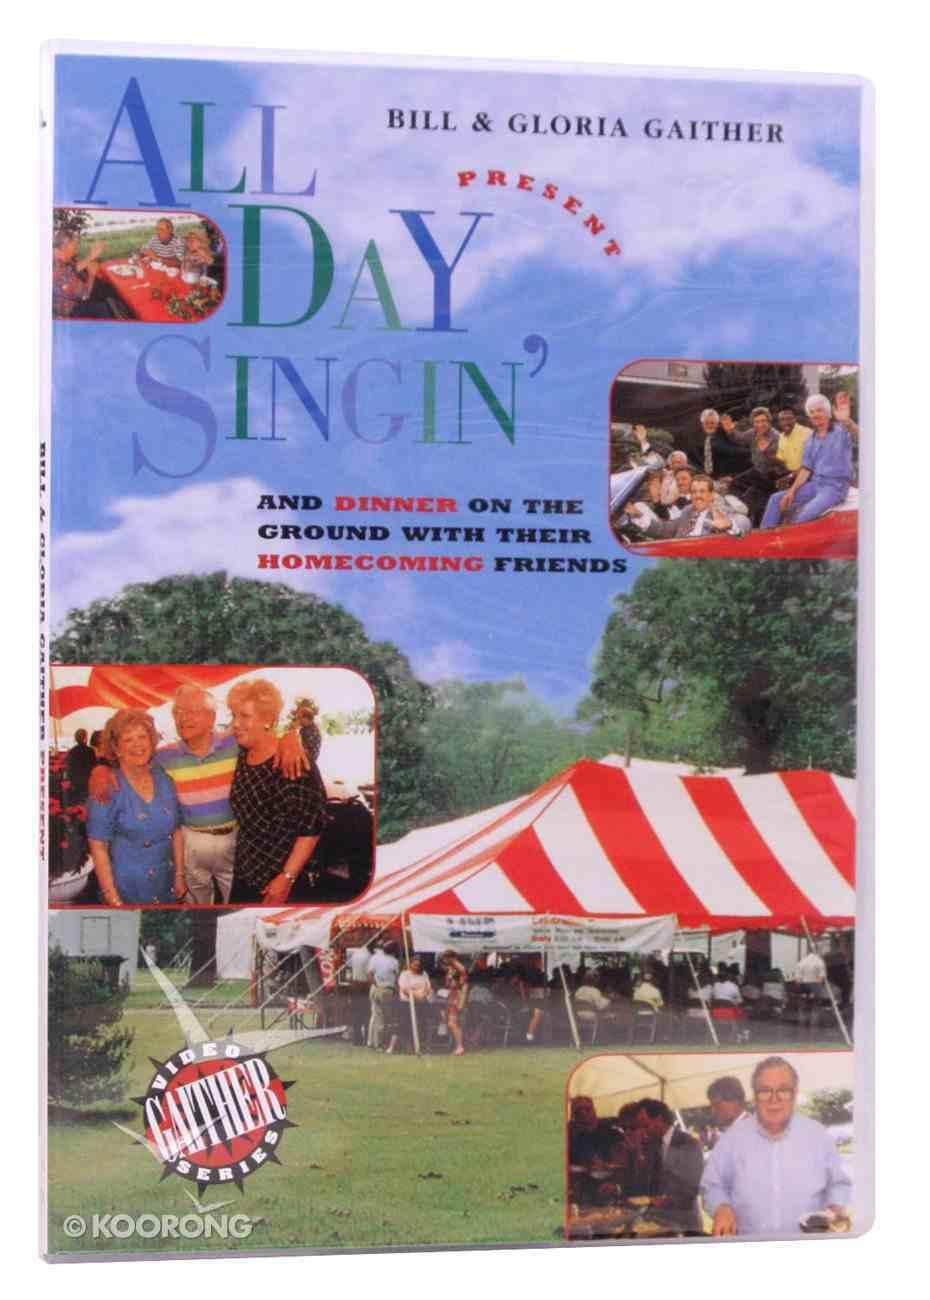 All Day Singin' & Dinner on the Ground (Gaither Gospel Series) DVD